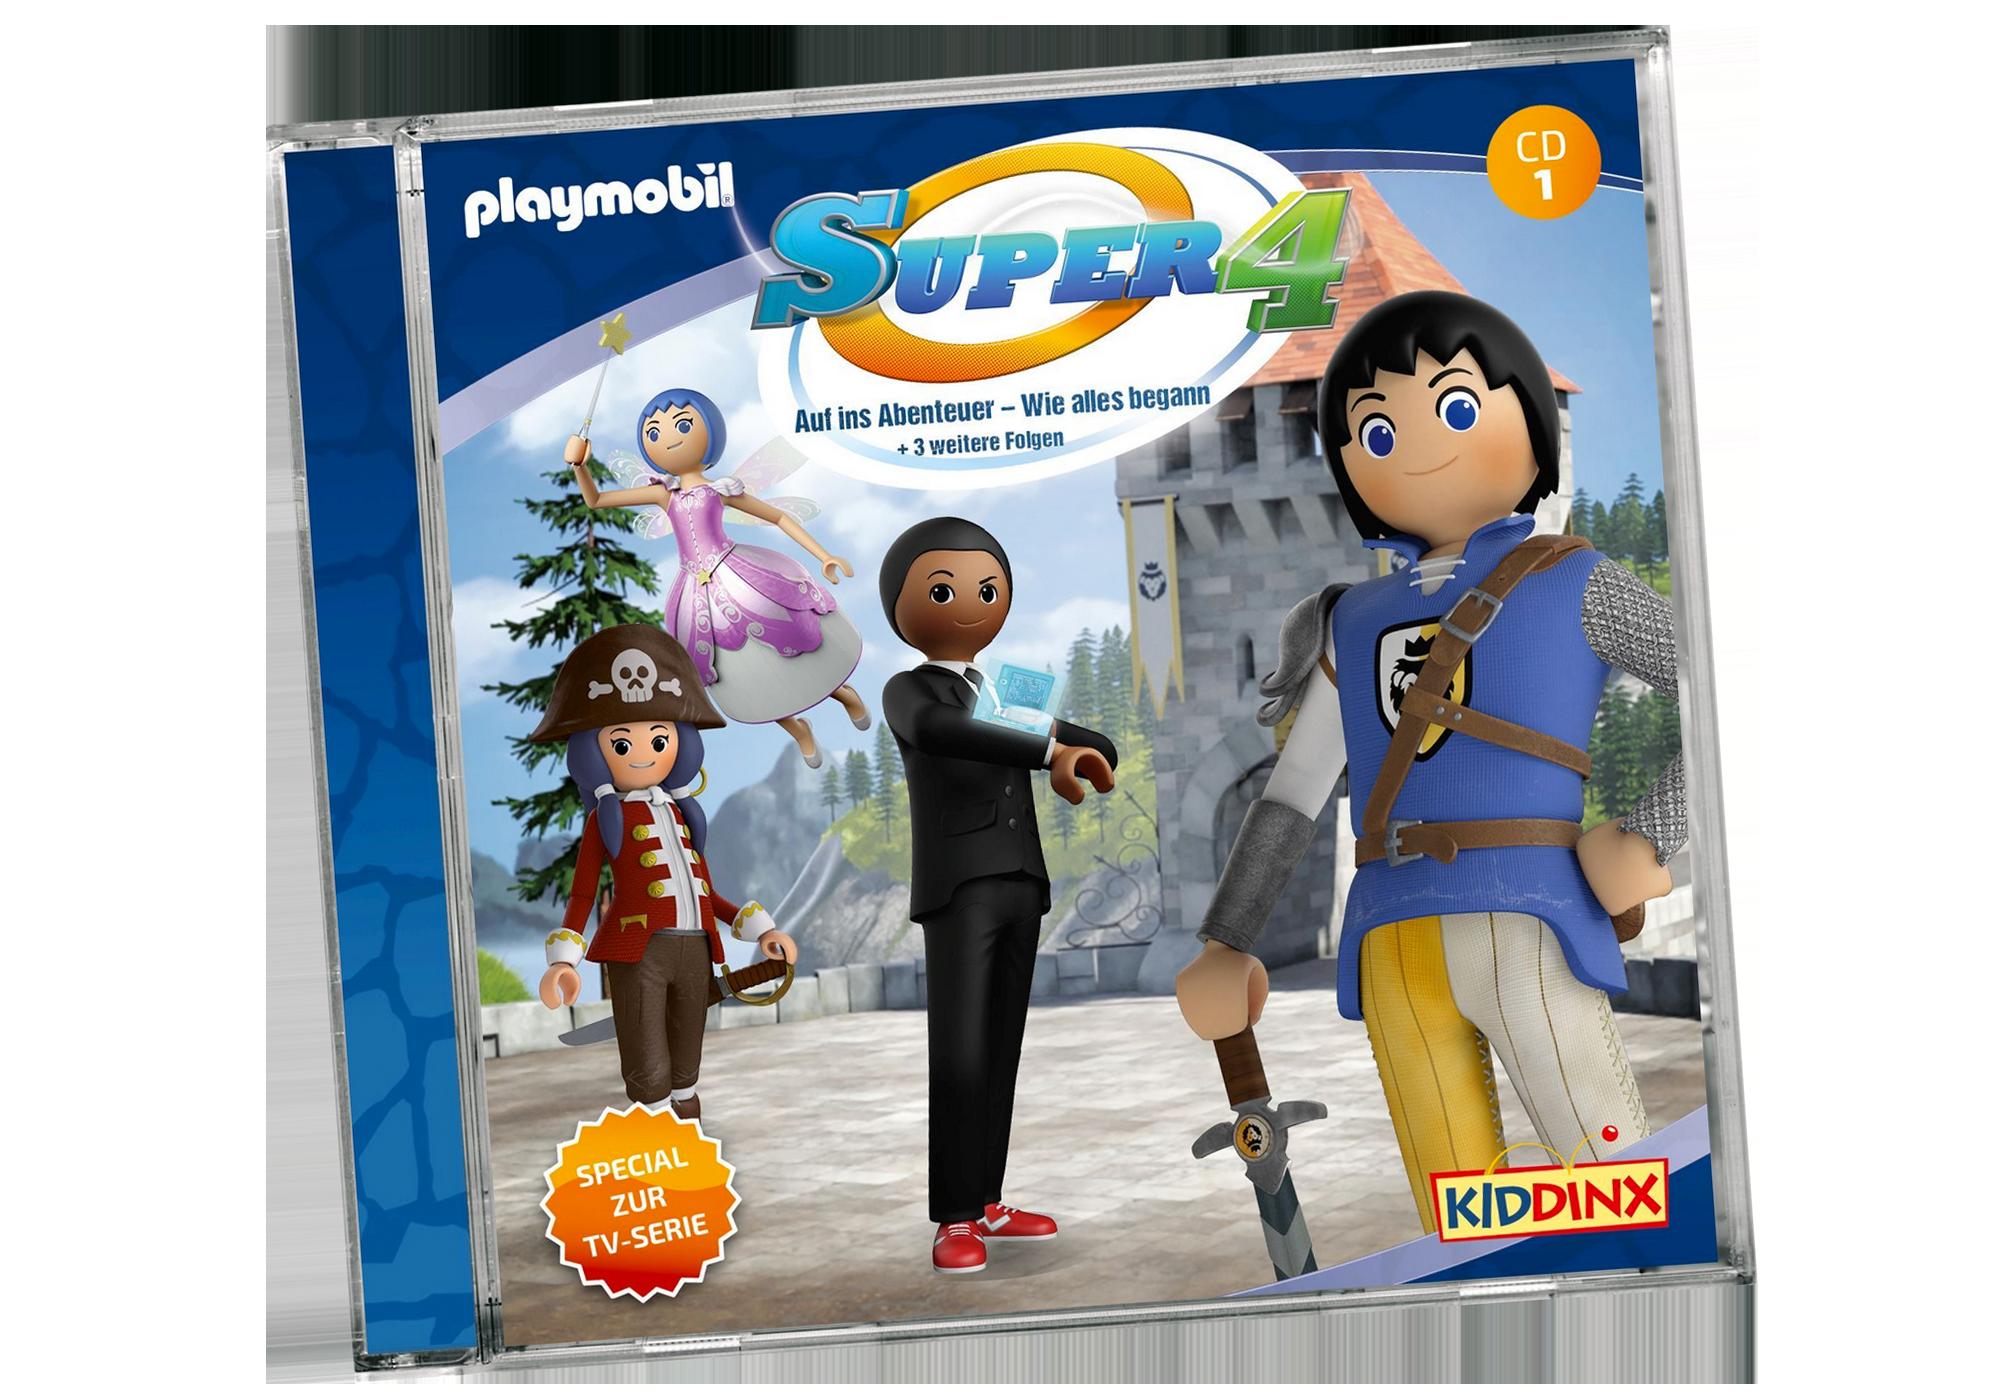 http://media.playmobil.com/i/playmobil/80474_product_detail/CD 1 Super4: Auf ins Abenteuer - Wie alles begann